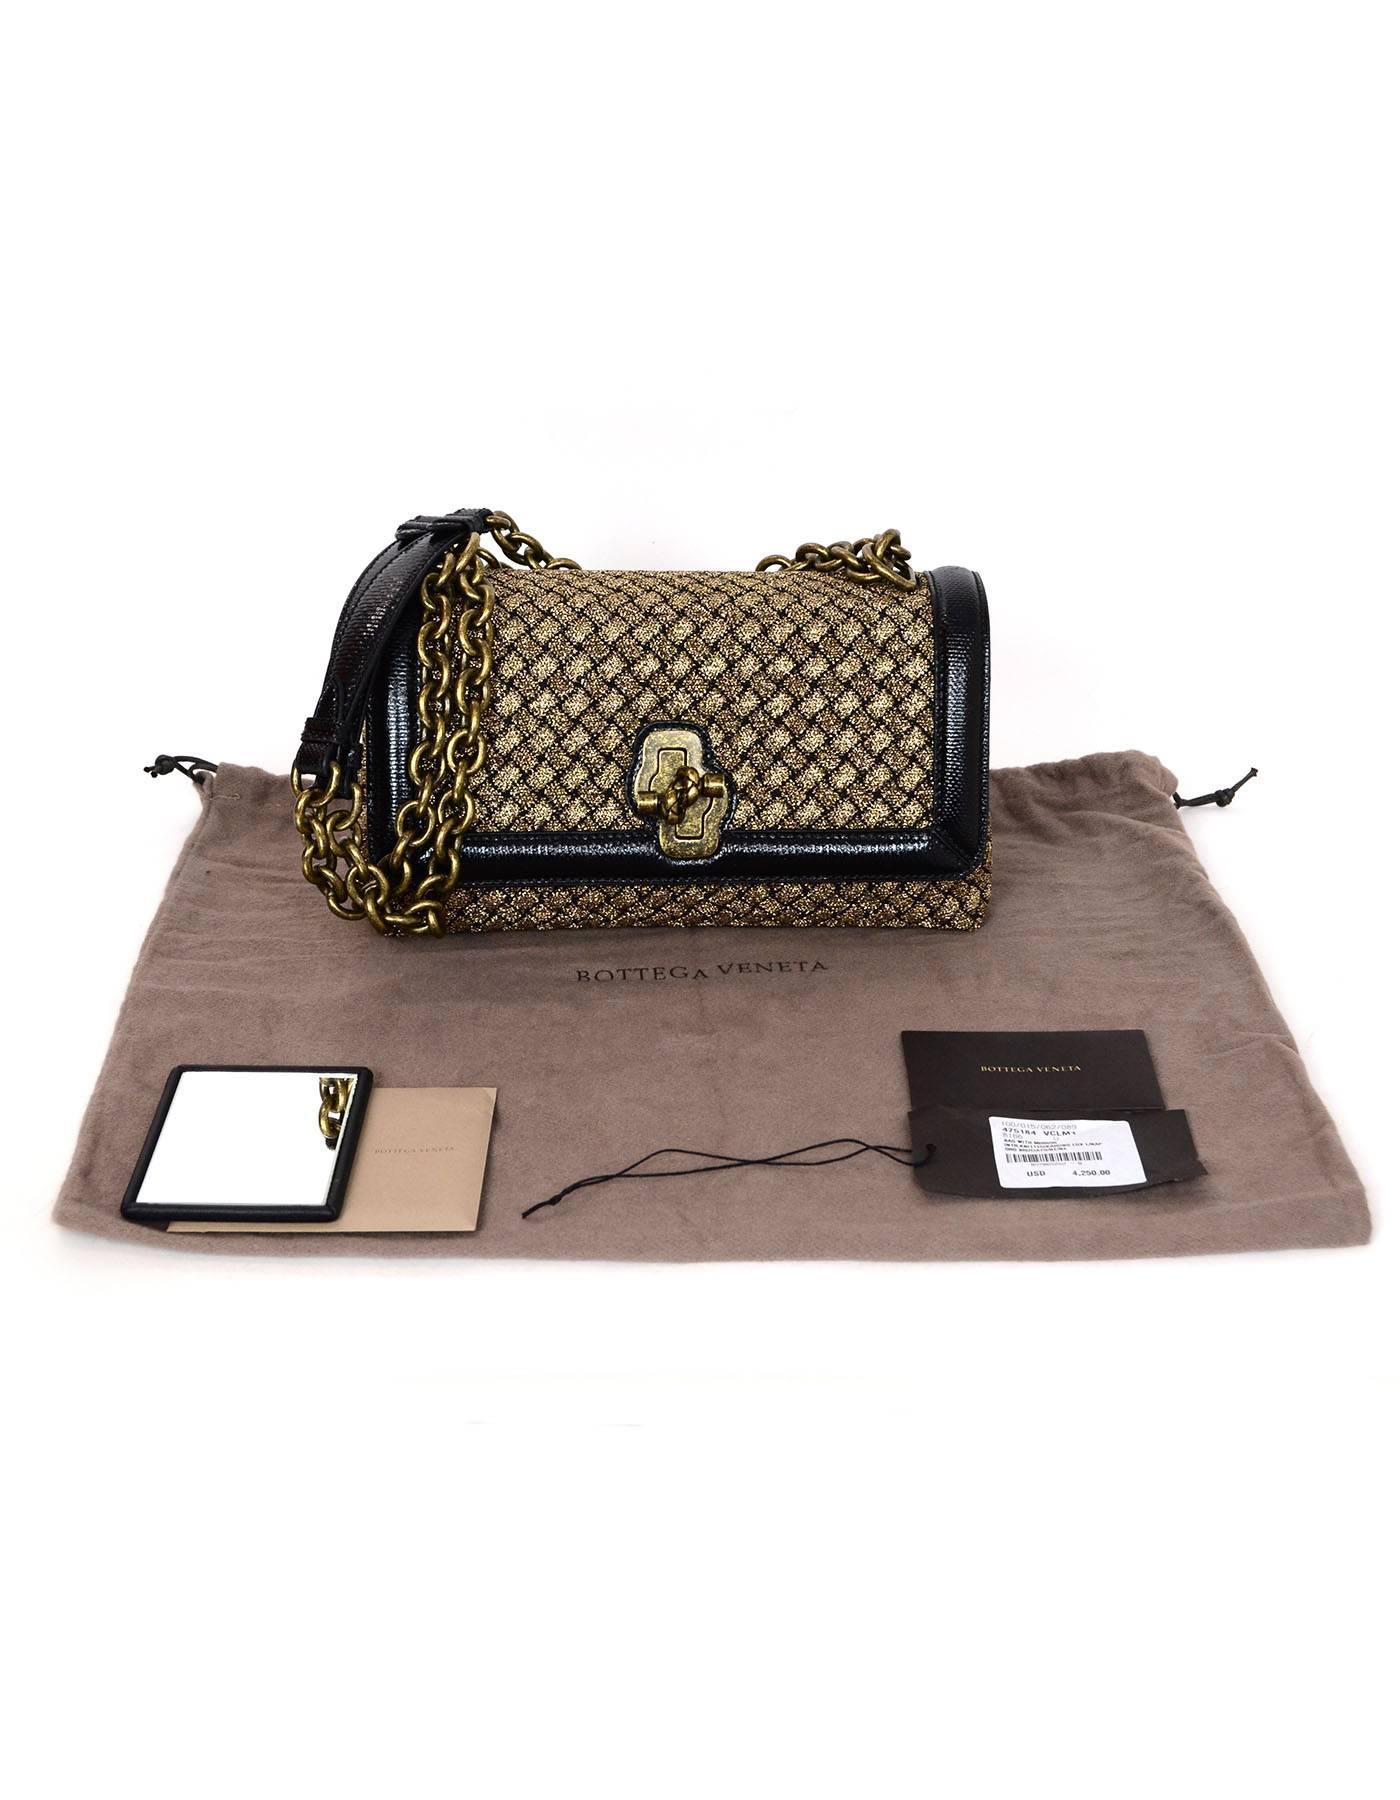 98b6e837e886 Bottega Veneta NEW 2018 Gold Black Intrecciato Woven Olimpia Knot Bag For  Sale at 1stdibs